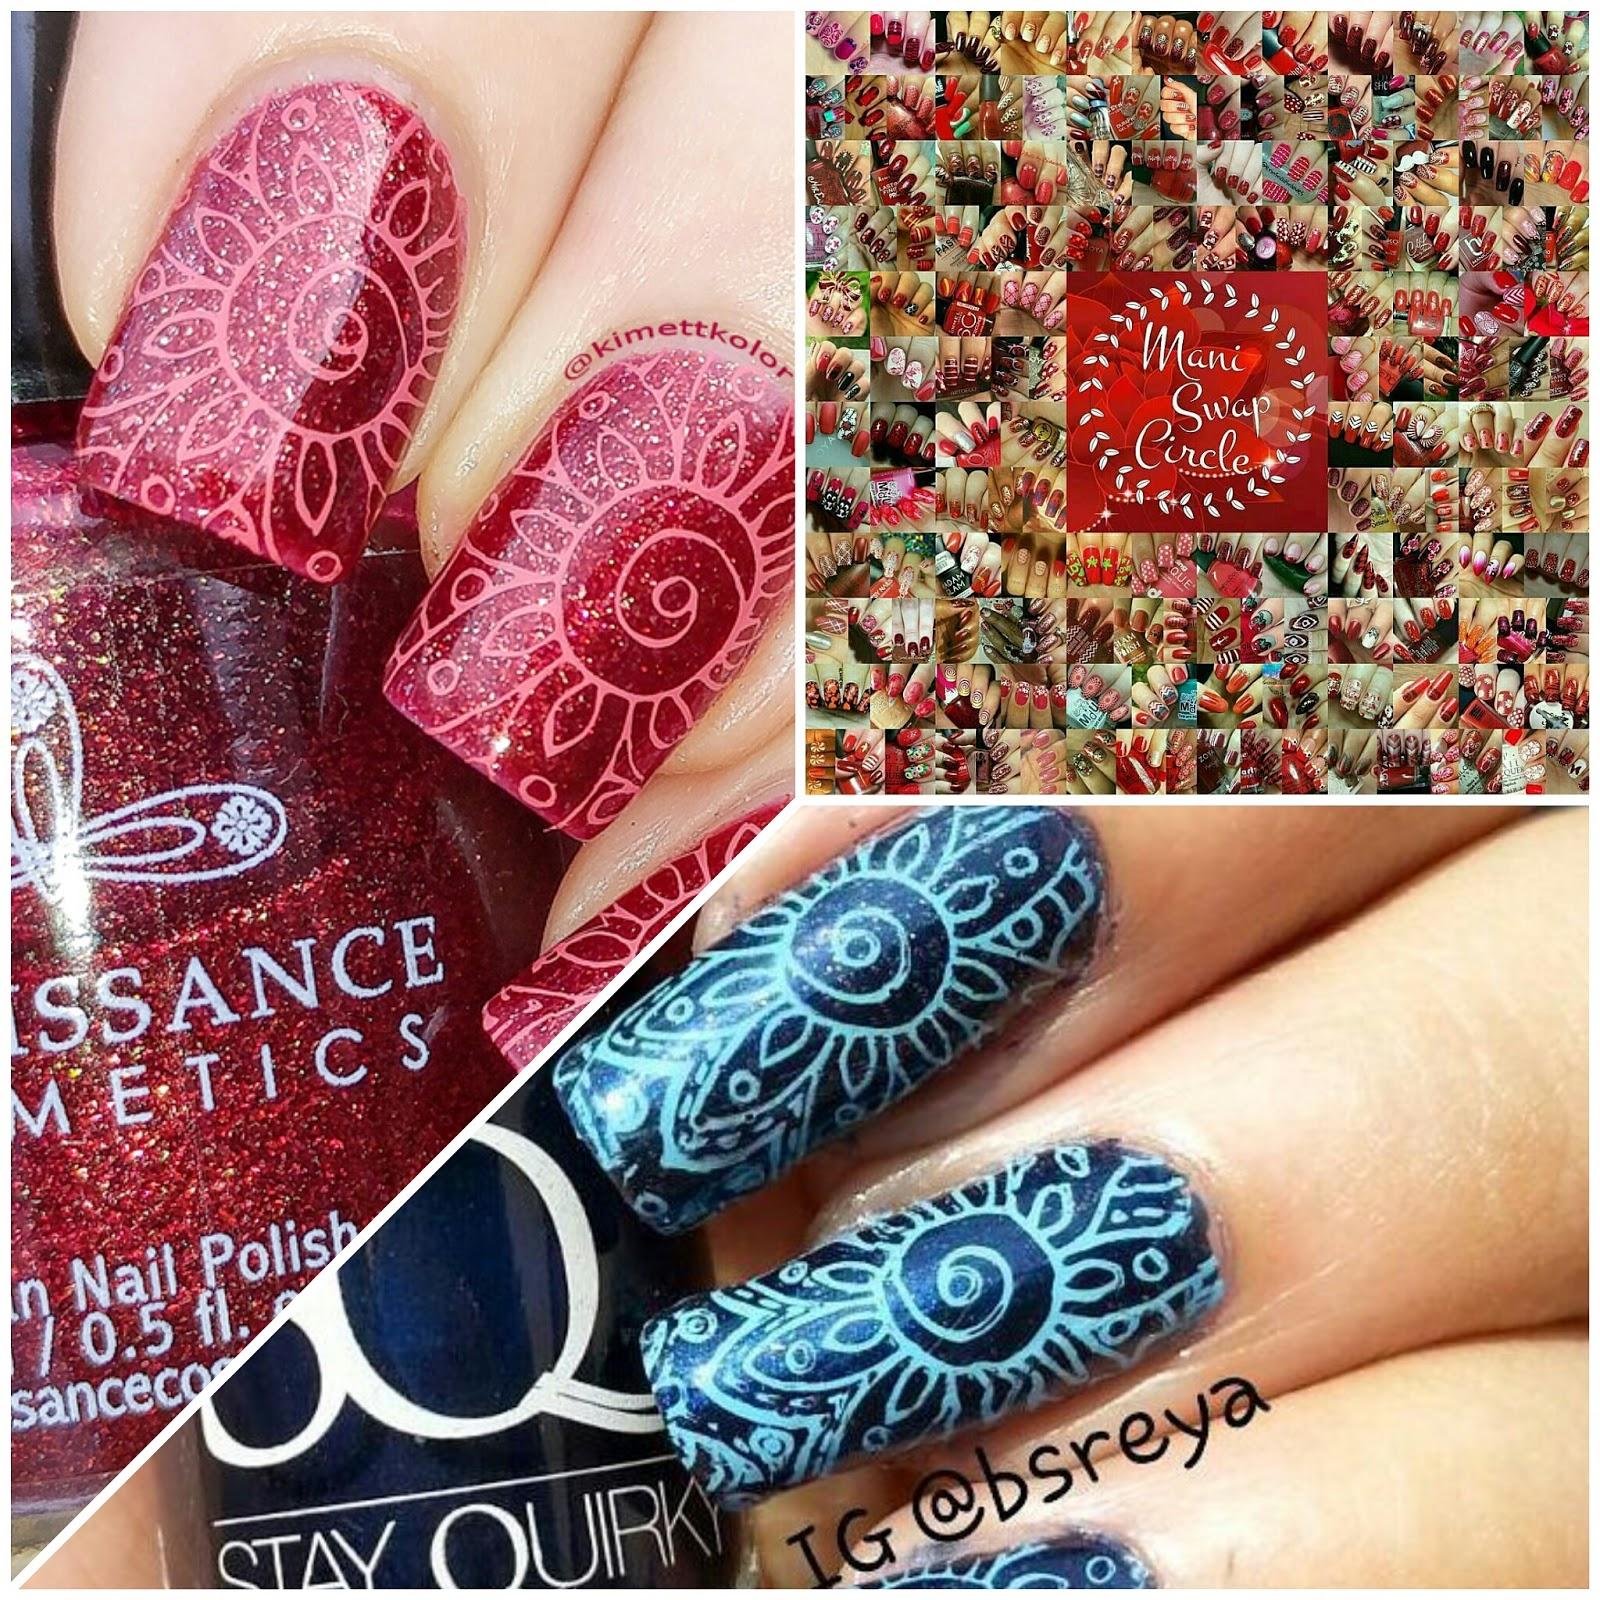 KimettKolor ManiSwapCircle Red Nail Art